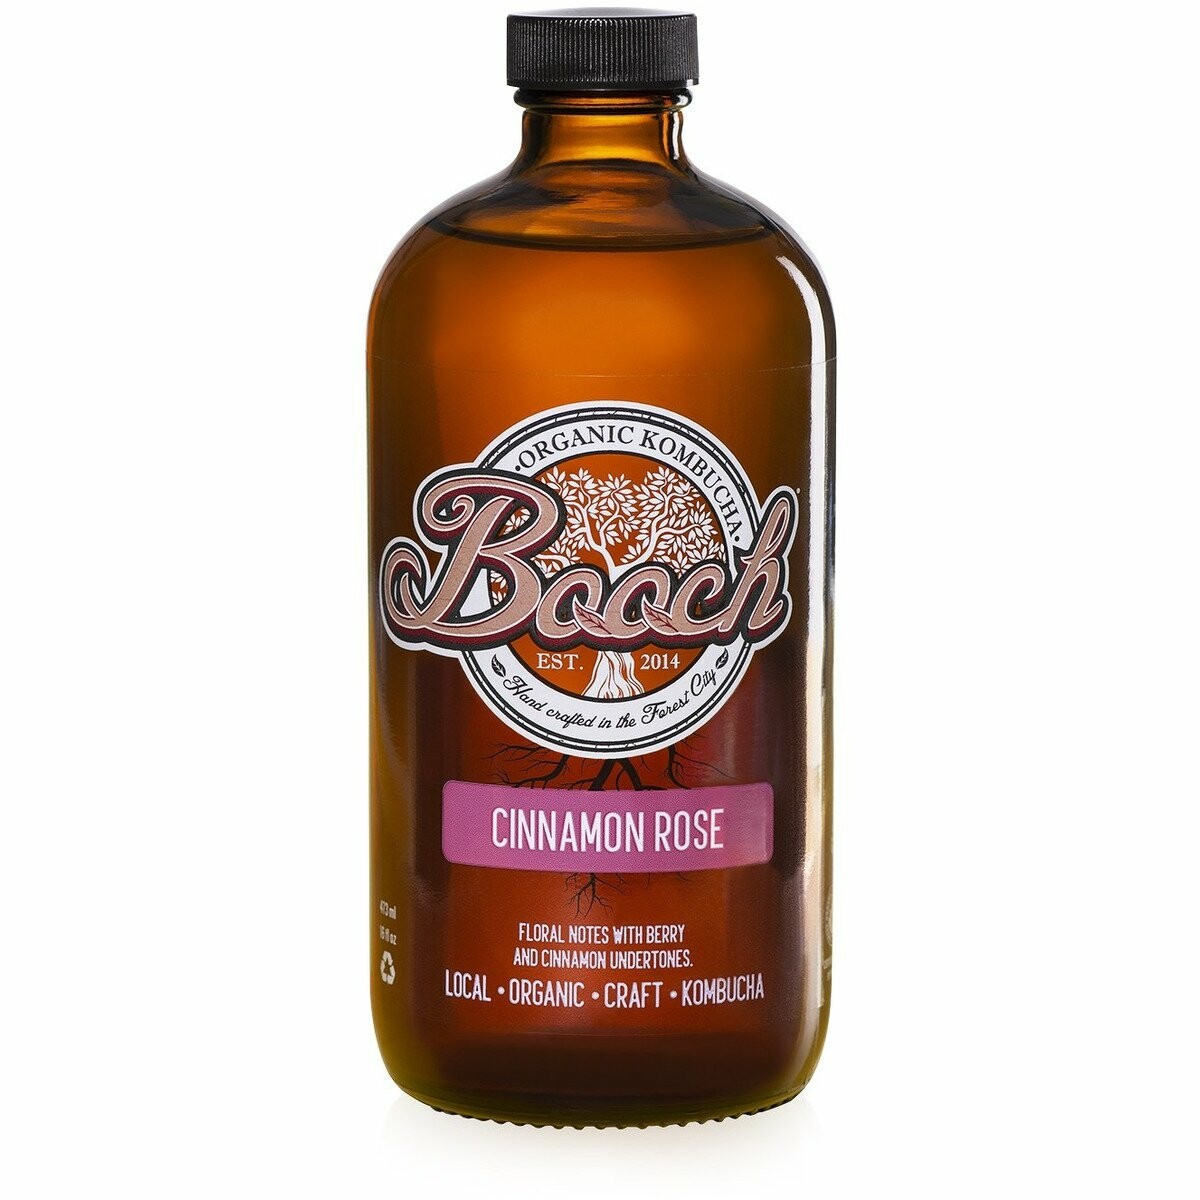 Booch Cinnamon Rose Kombucha - London Ontario